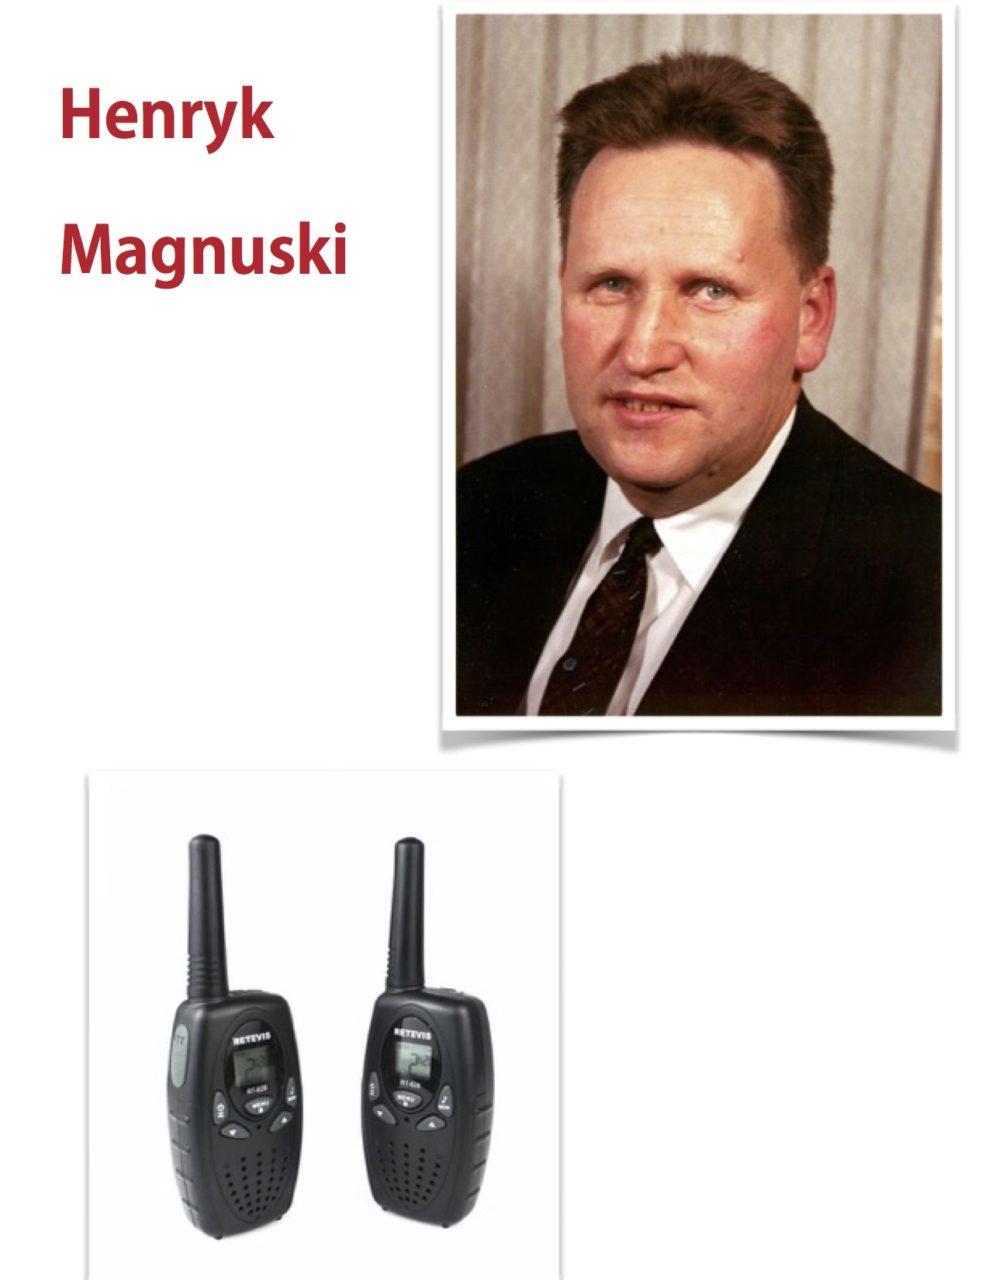 Henryk Magnuski